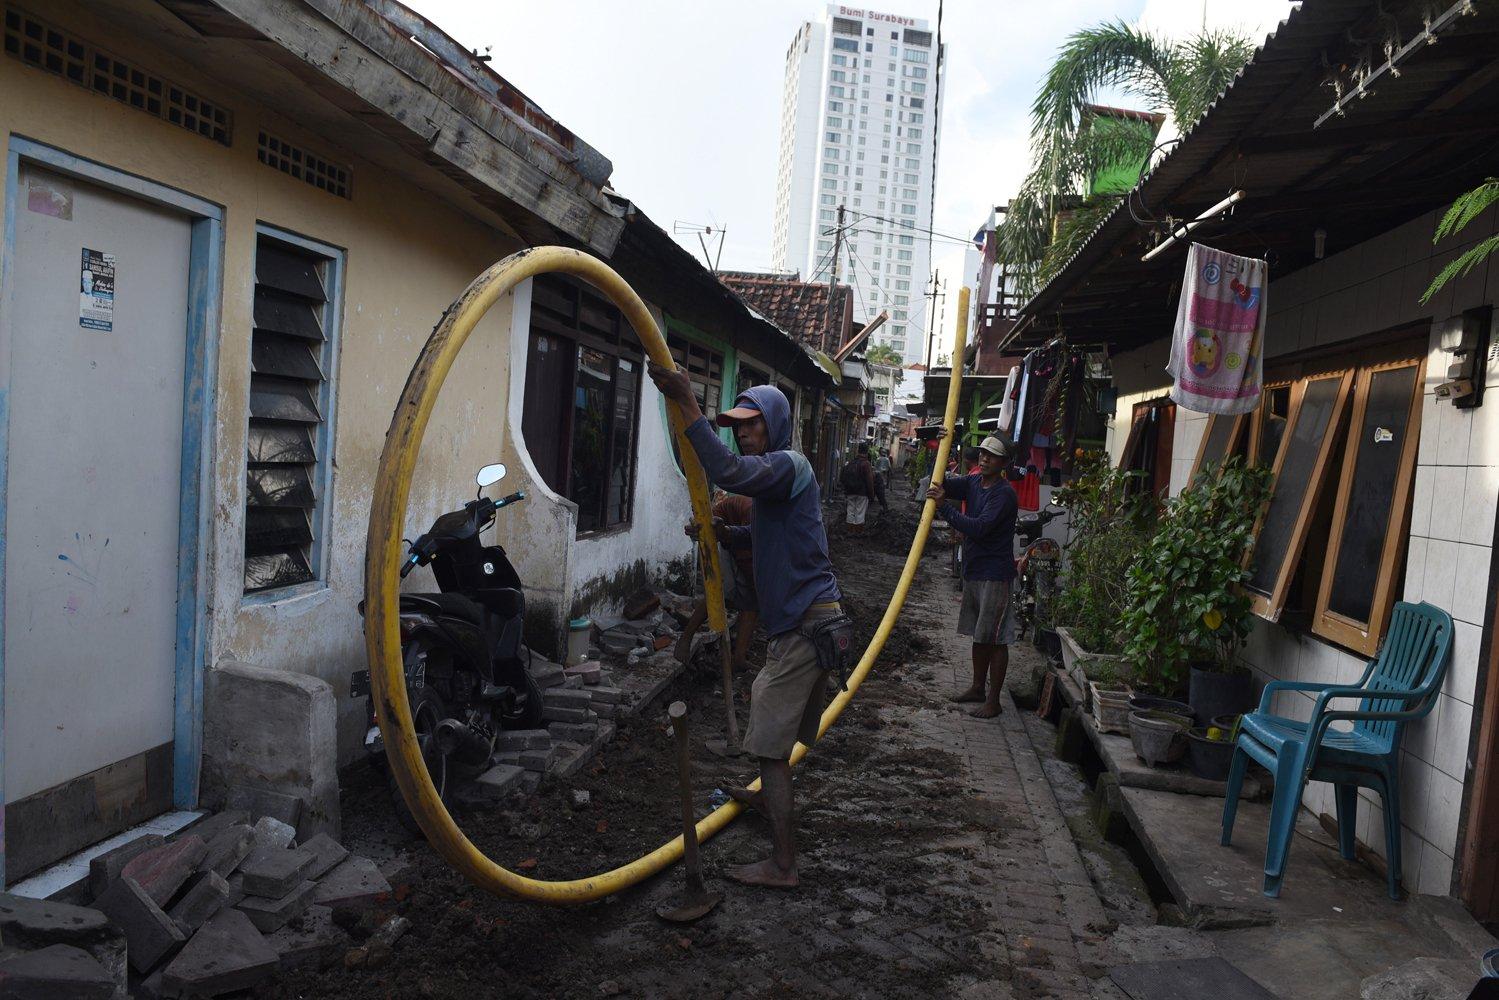 Pekerja menyelesaikan pemasangan pipa gas PGN di sebuah permukiman di Surabaya, Jawa Timur.